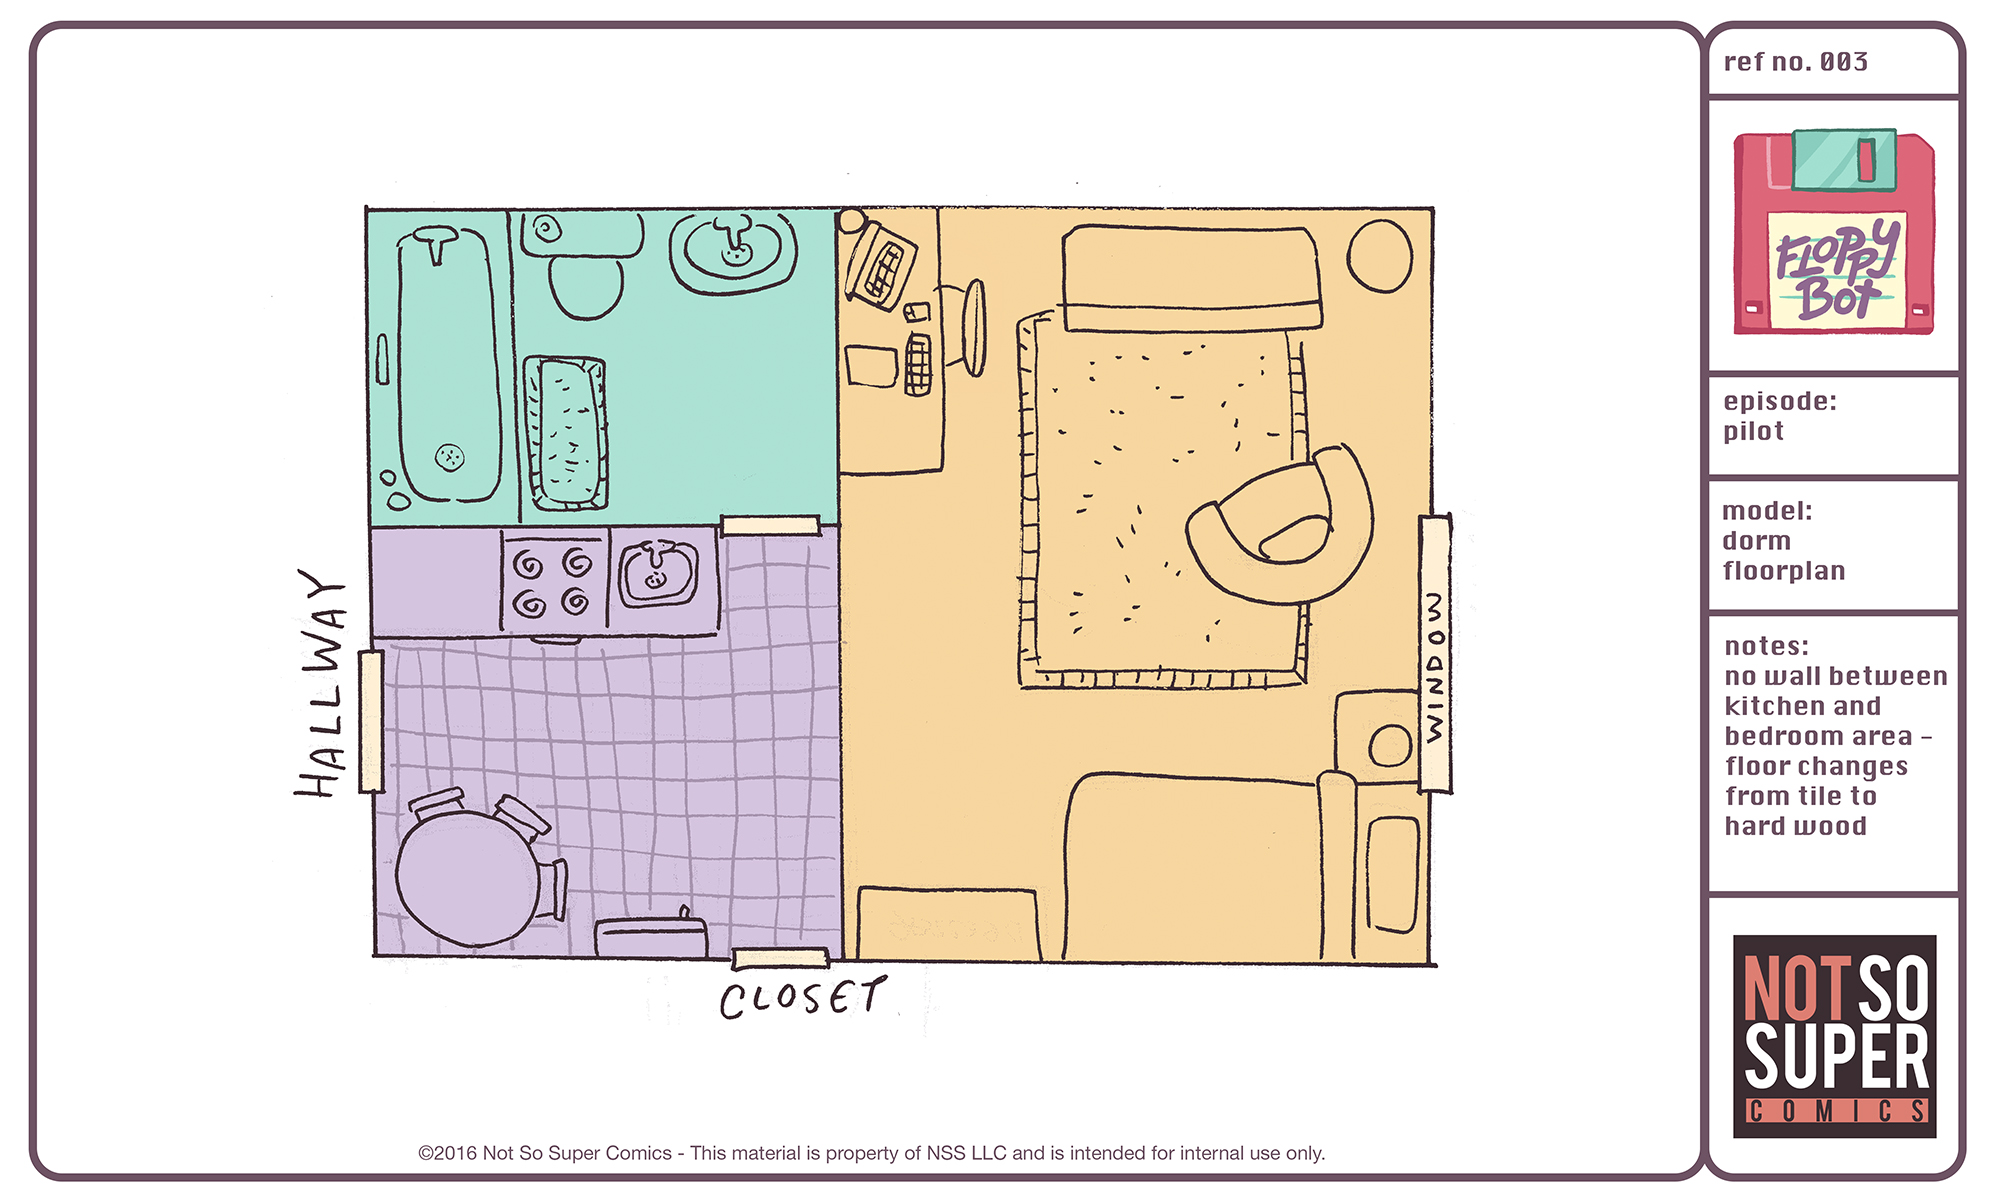 FB003-Dorm-FloorPlan.jpg